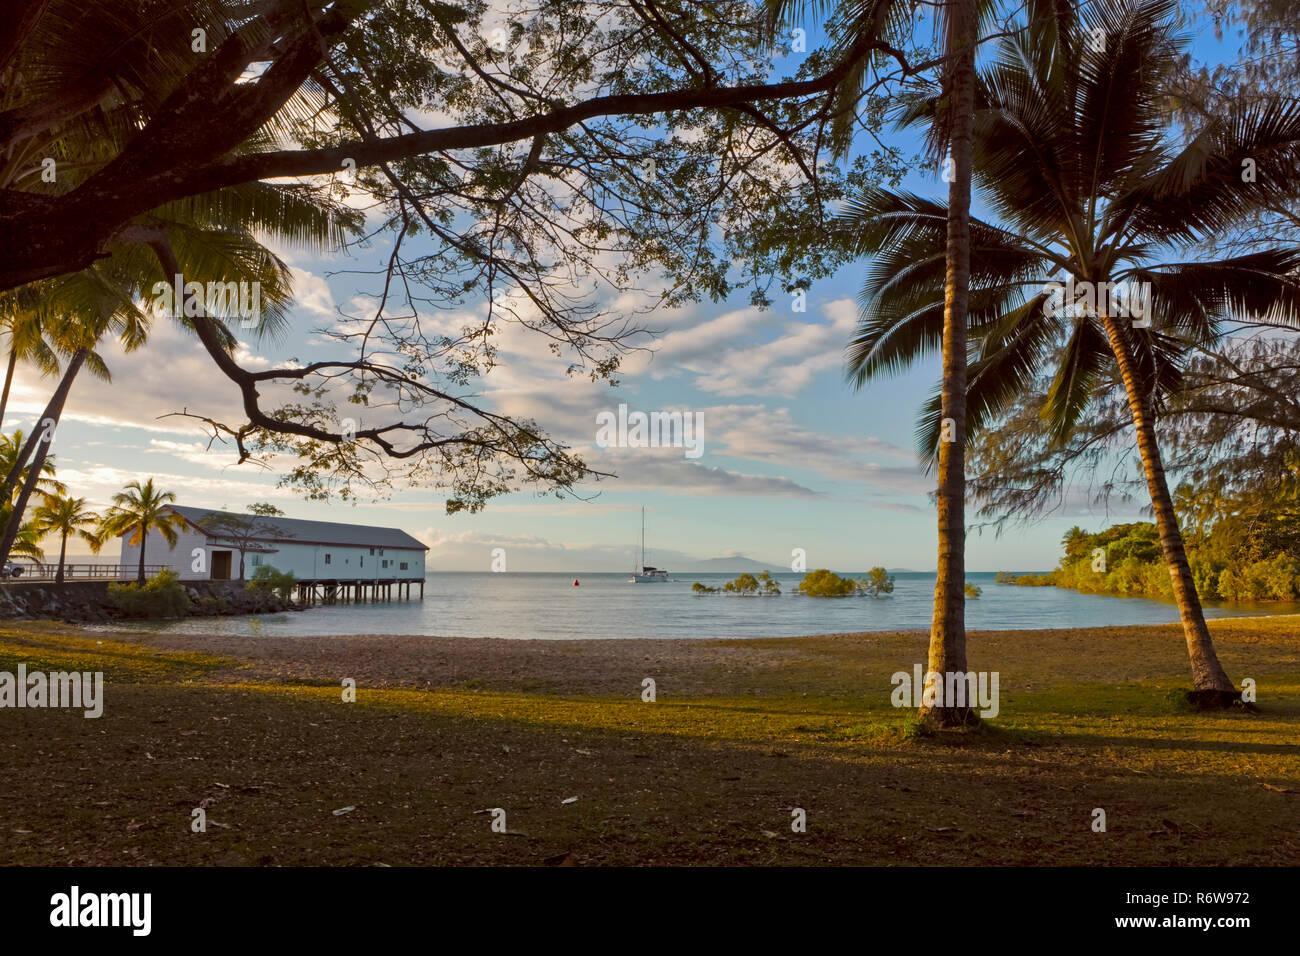 Port Douglas in North Queensland, Australia - Stock Image